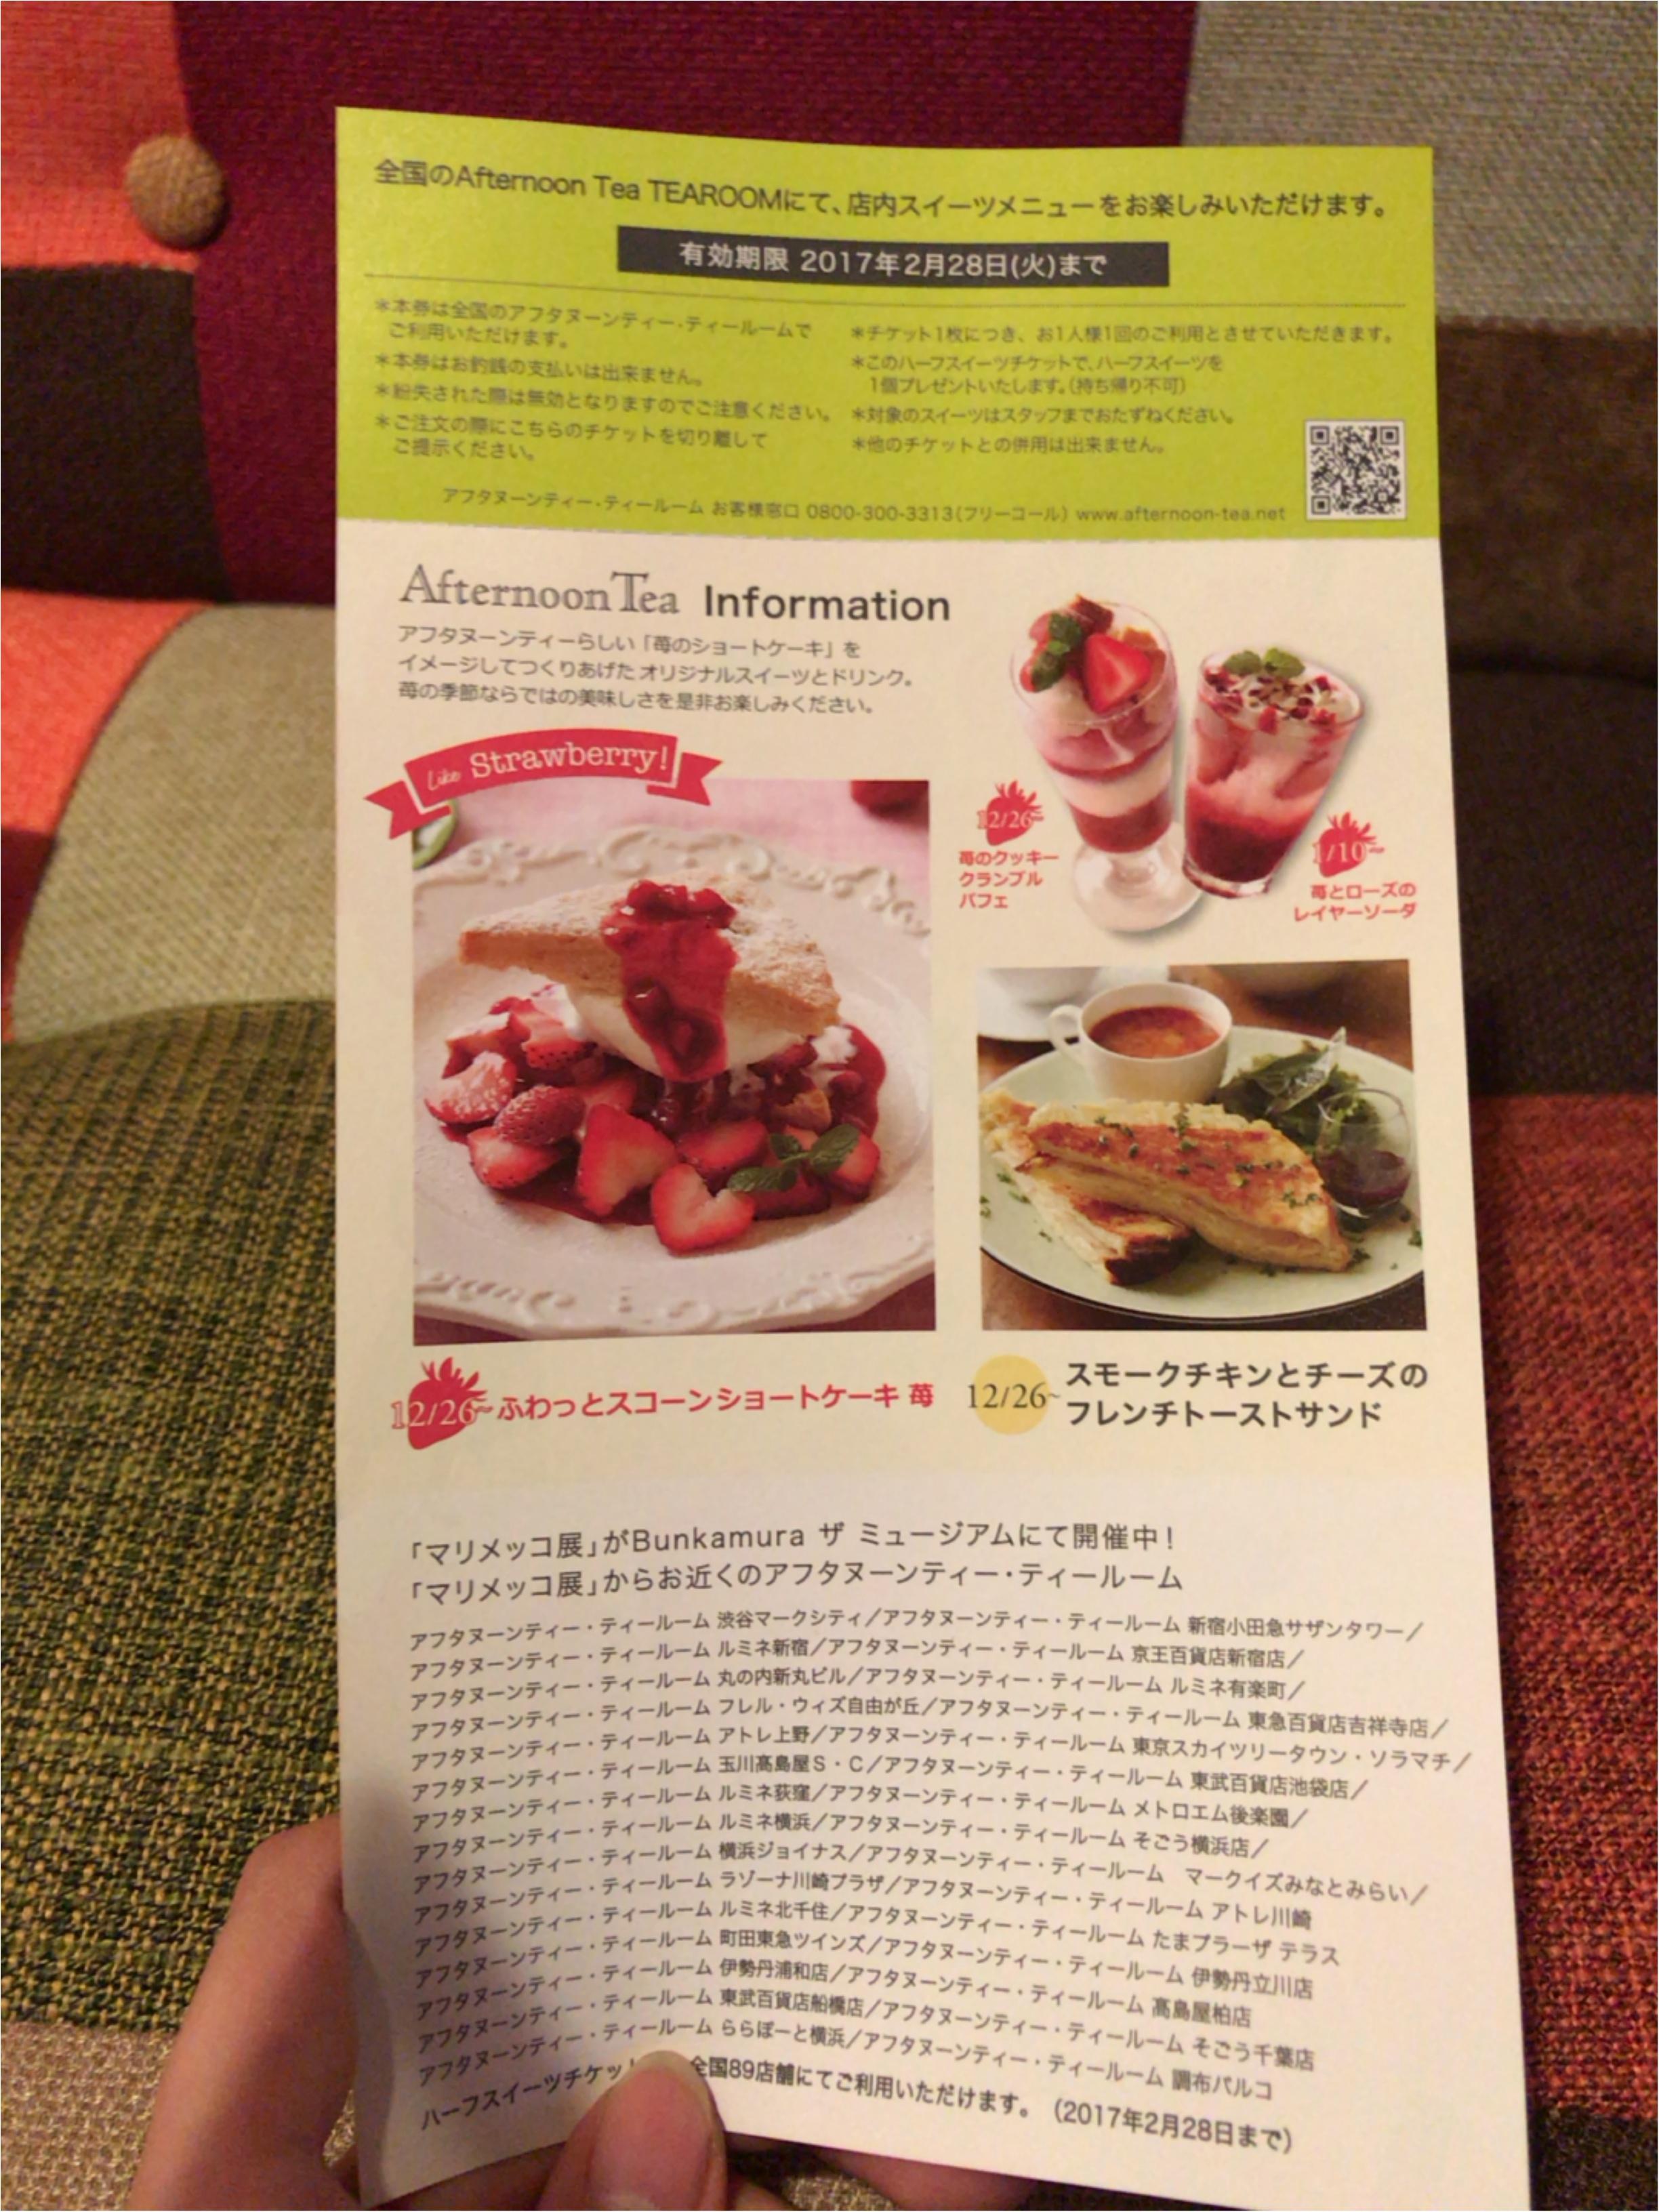 marimekko~渋谷で開催中のマリメッコ展へ行ってきました♡_4